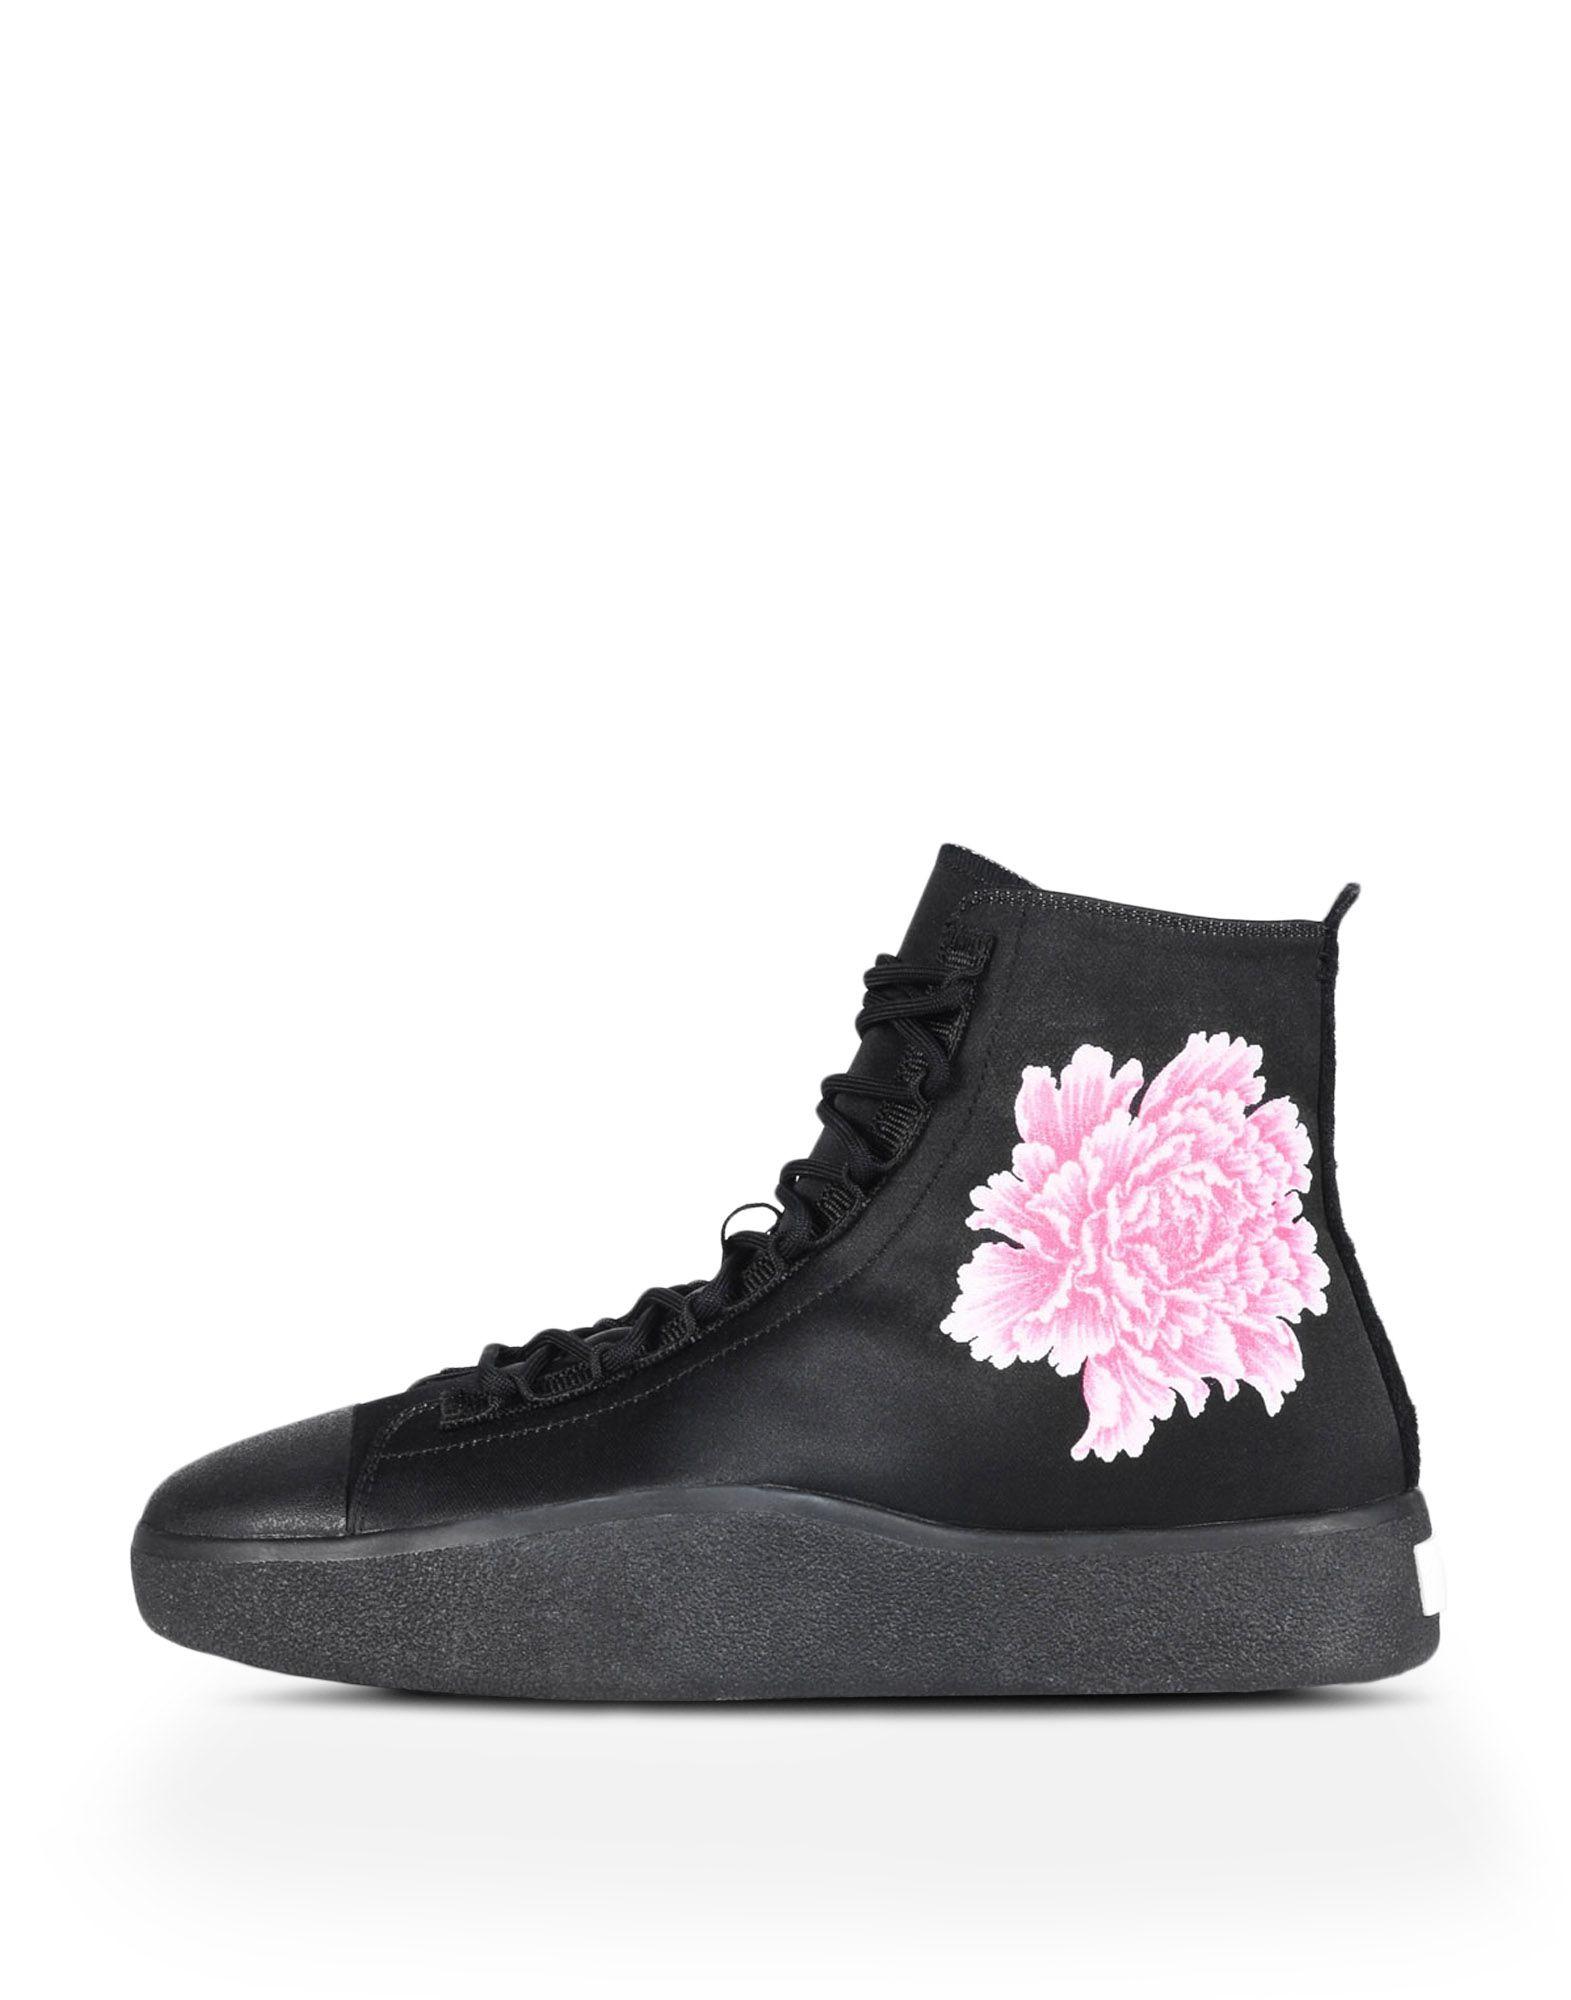 Y-3 Bashyo Floral Hi-Top Sneakers